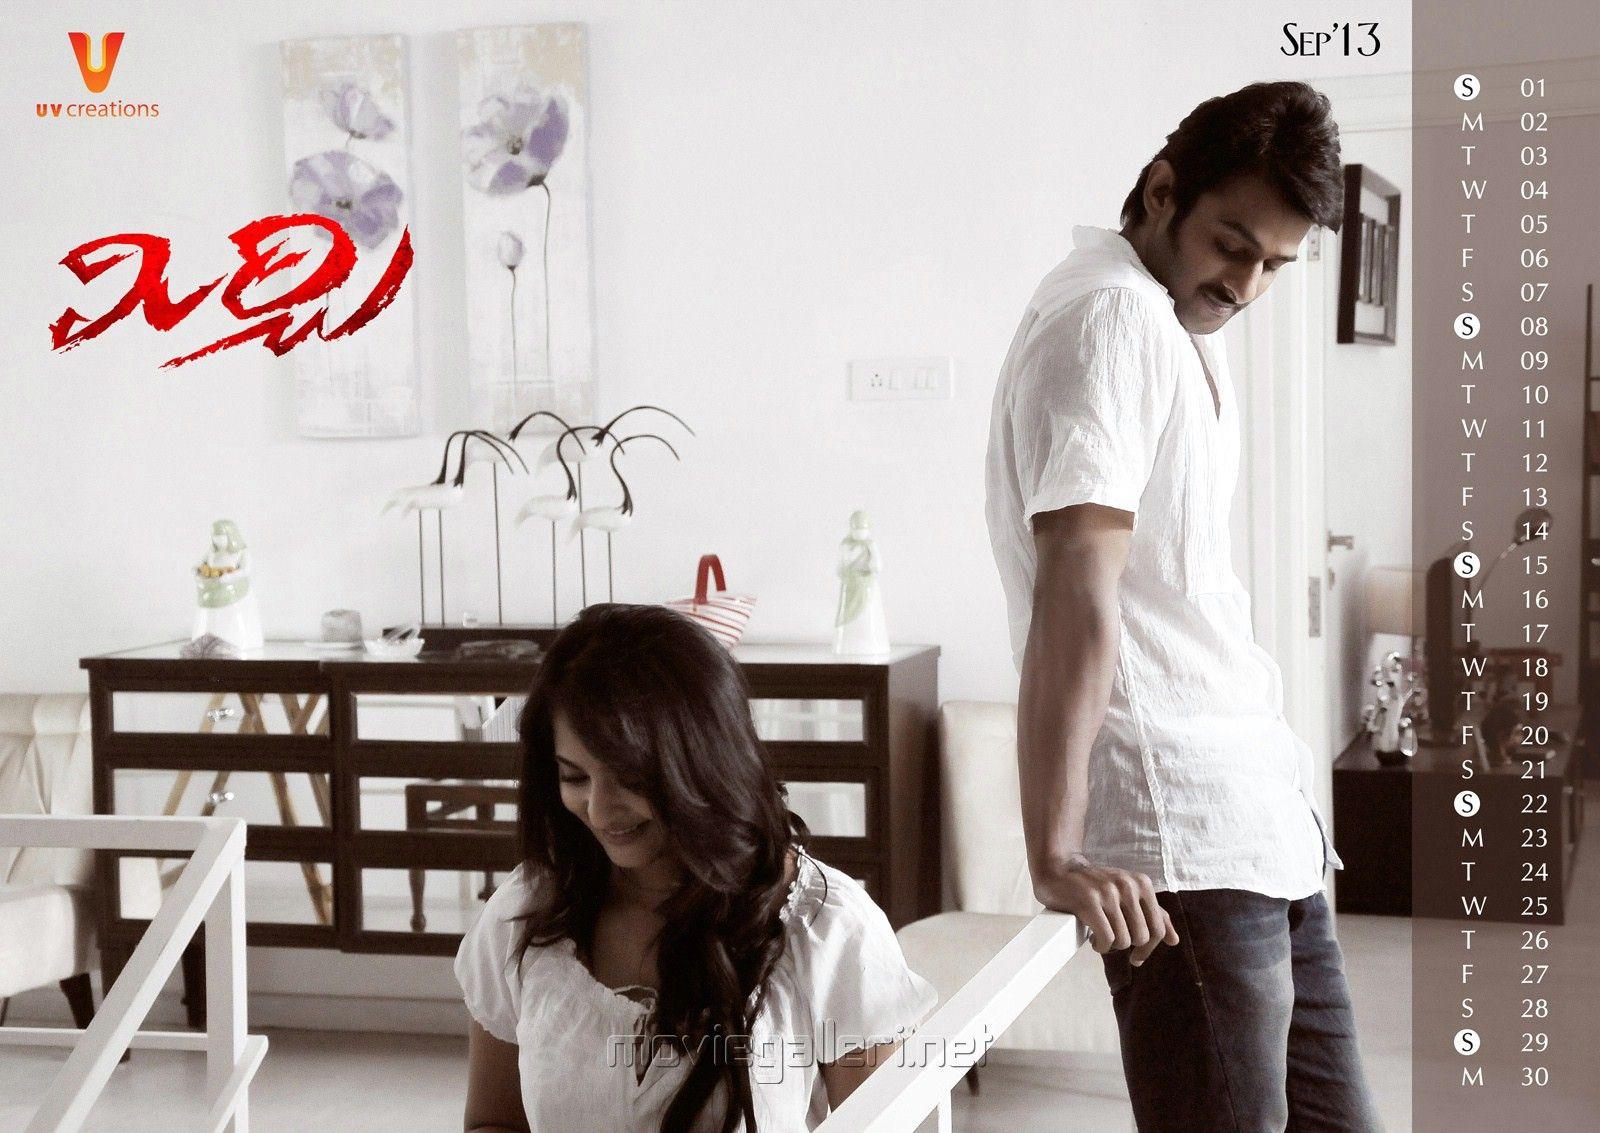 Anushka & Prabhas in Mirchi Movie 2013 Calendar Wallpapers ...